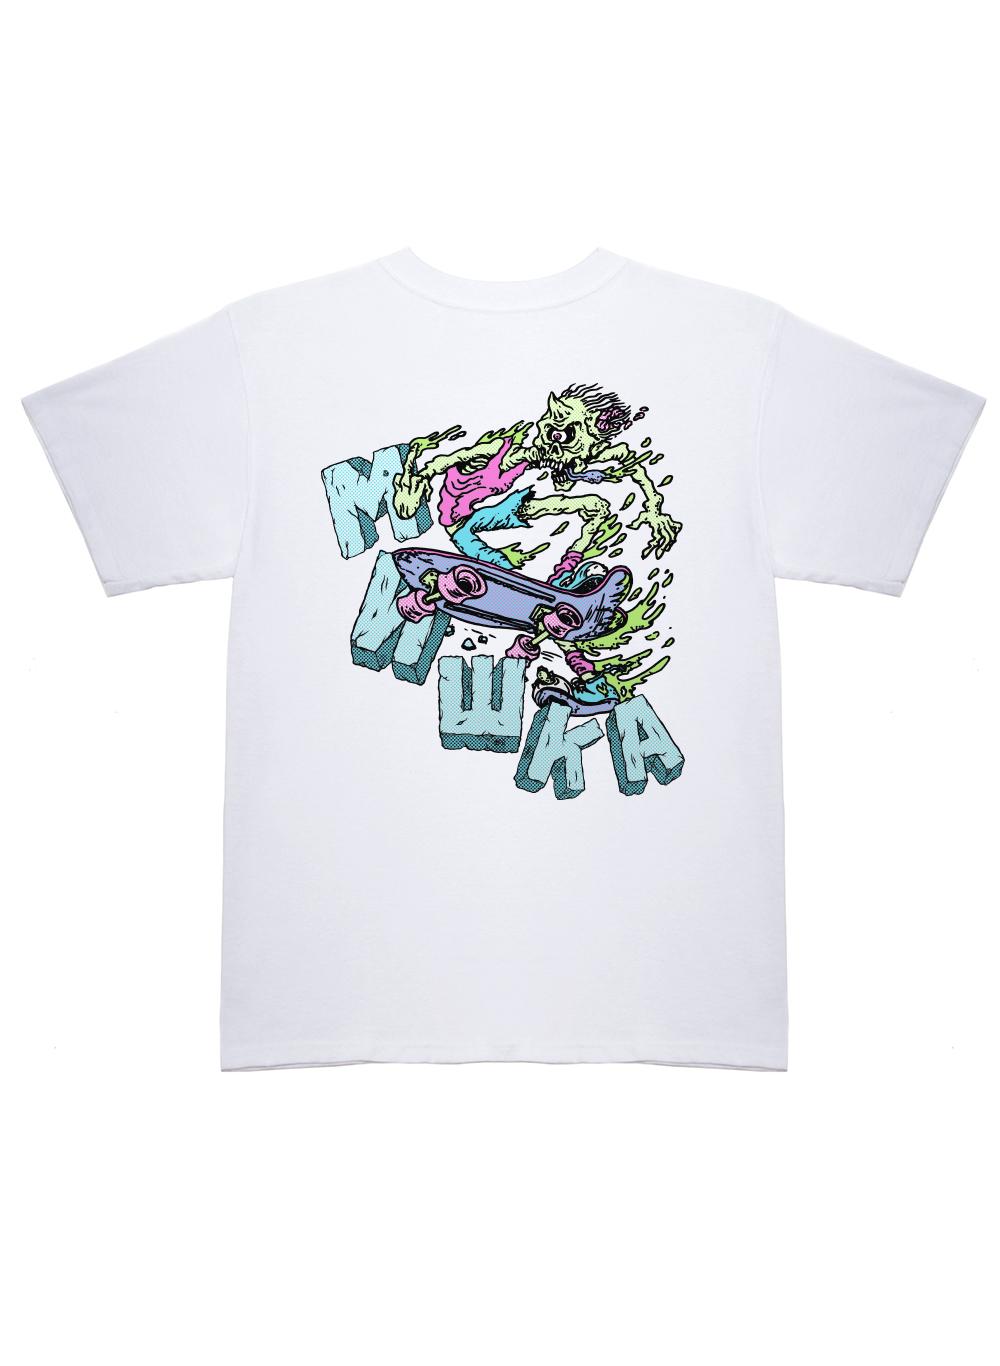 Lamour Supreme: Cyco Ripper T-Shirt